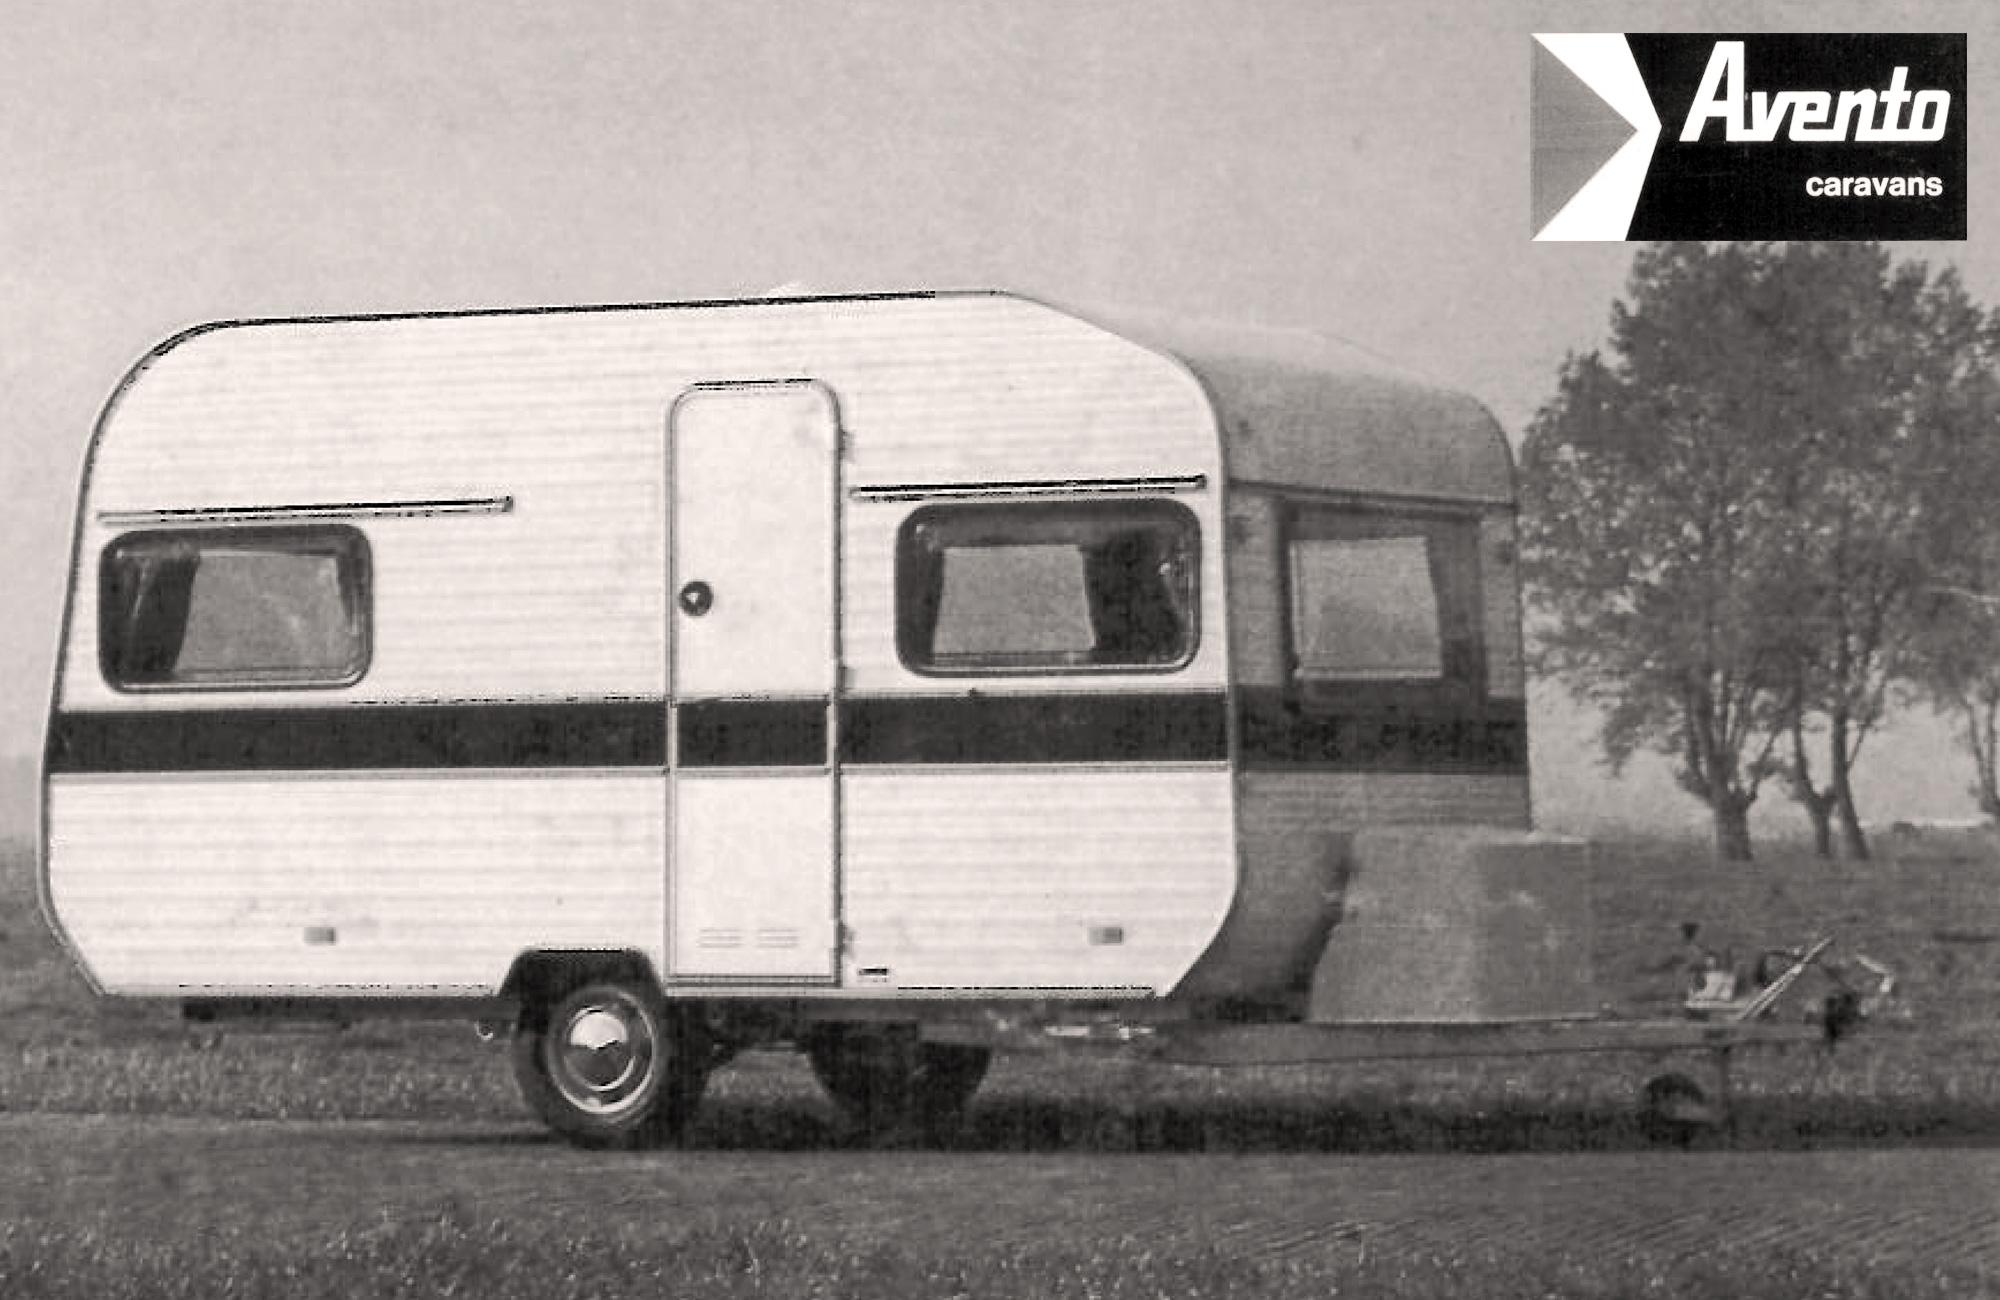 avento kip caravans tenten